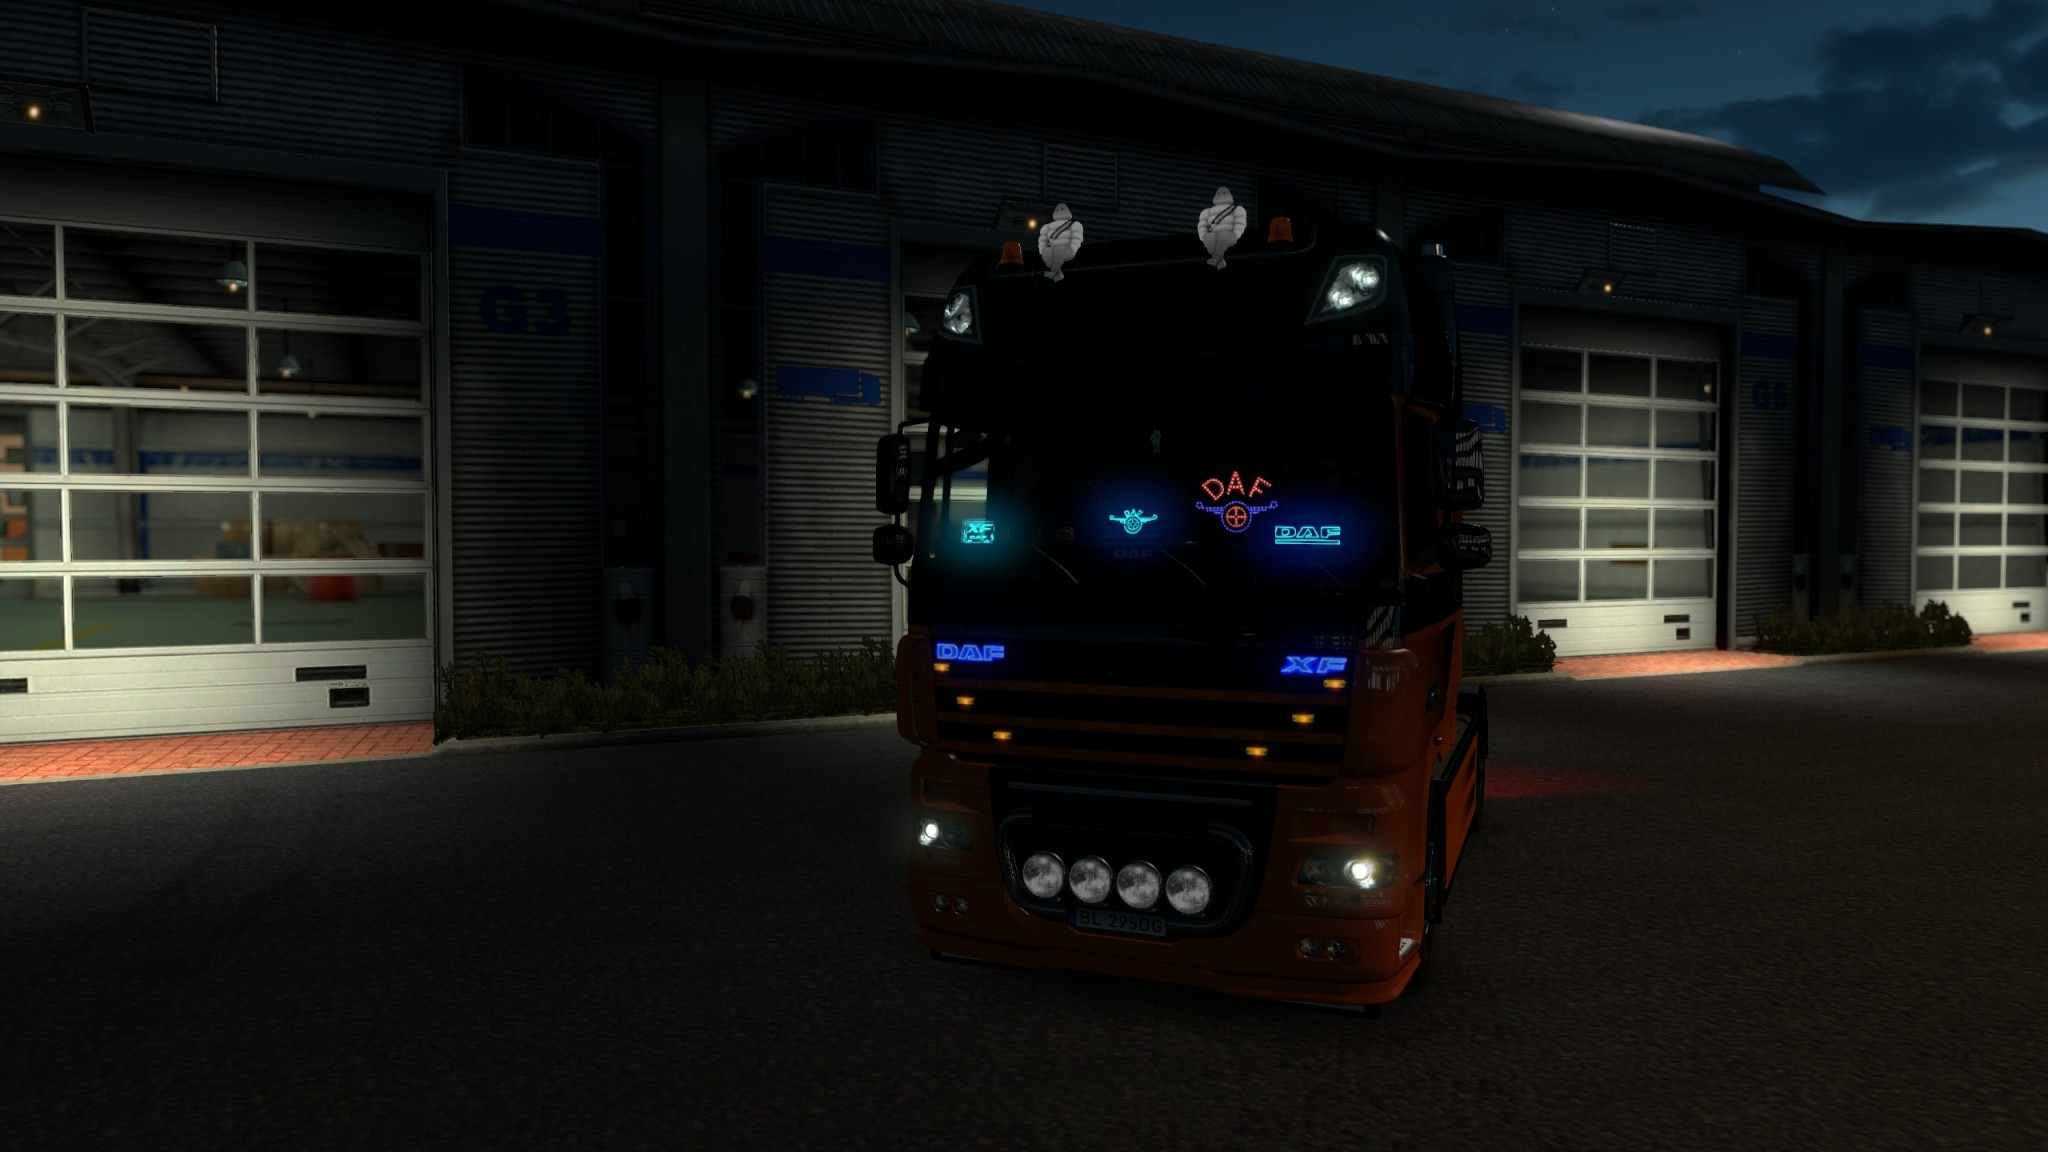 Euro Truck Simulator 2 - DAF Tuning Pack - DAF XF105